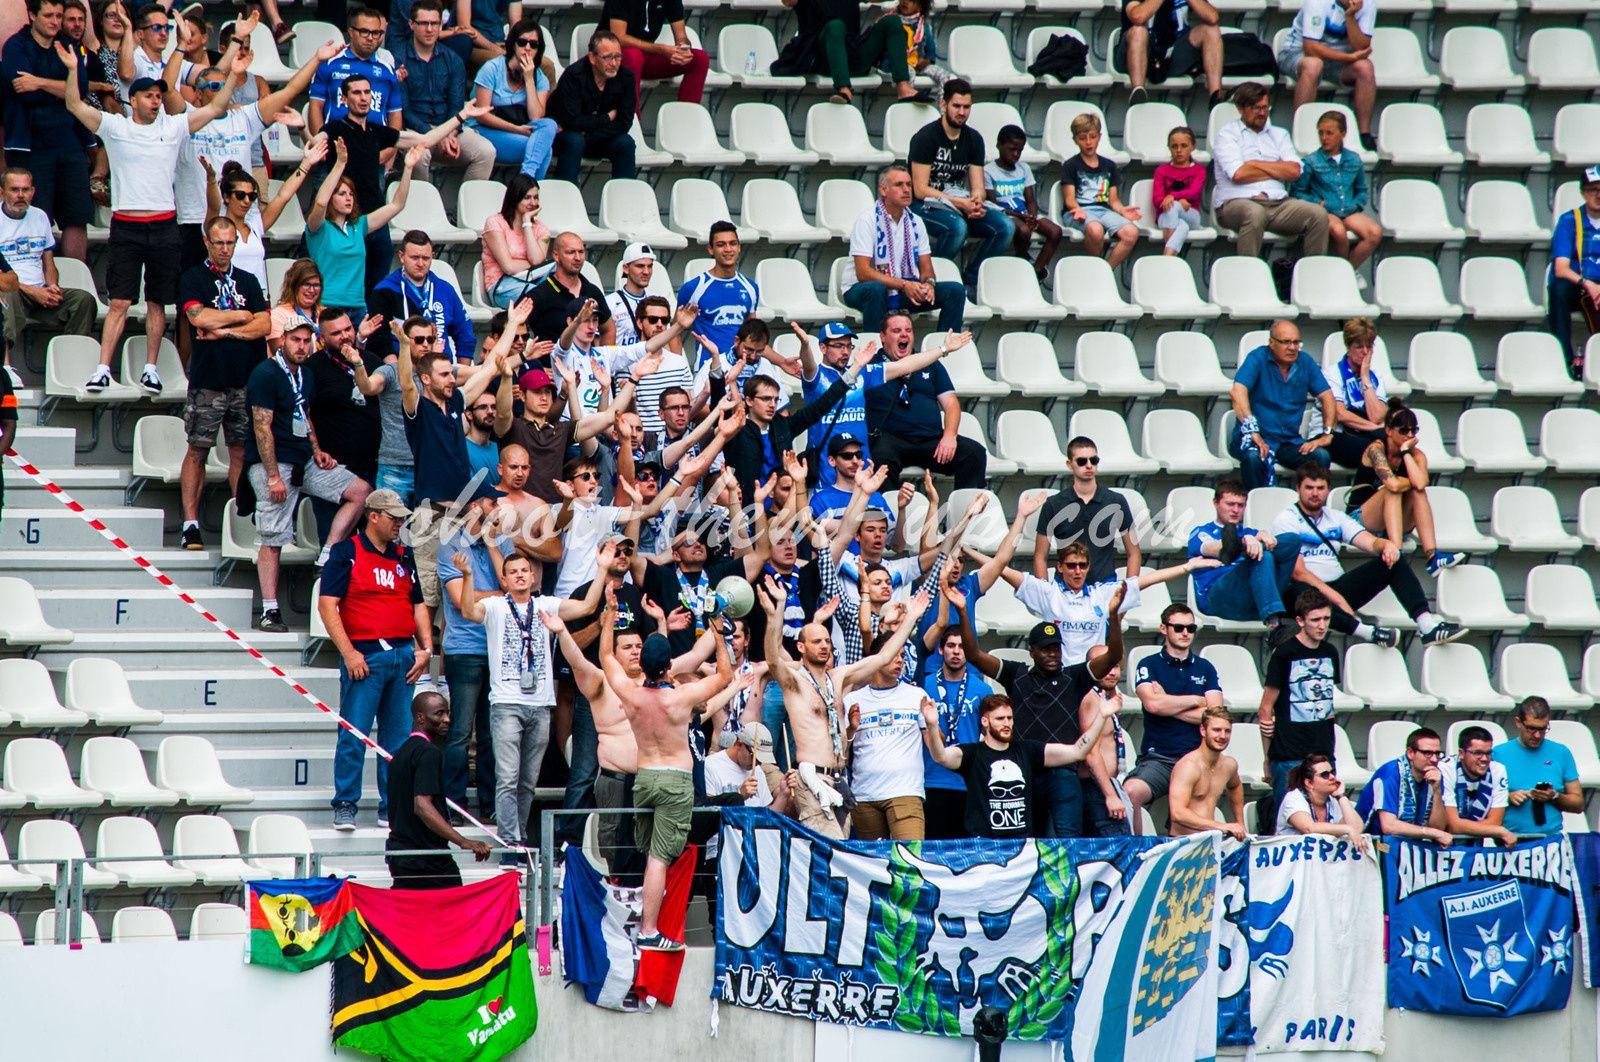 Ultras Auxerre